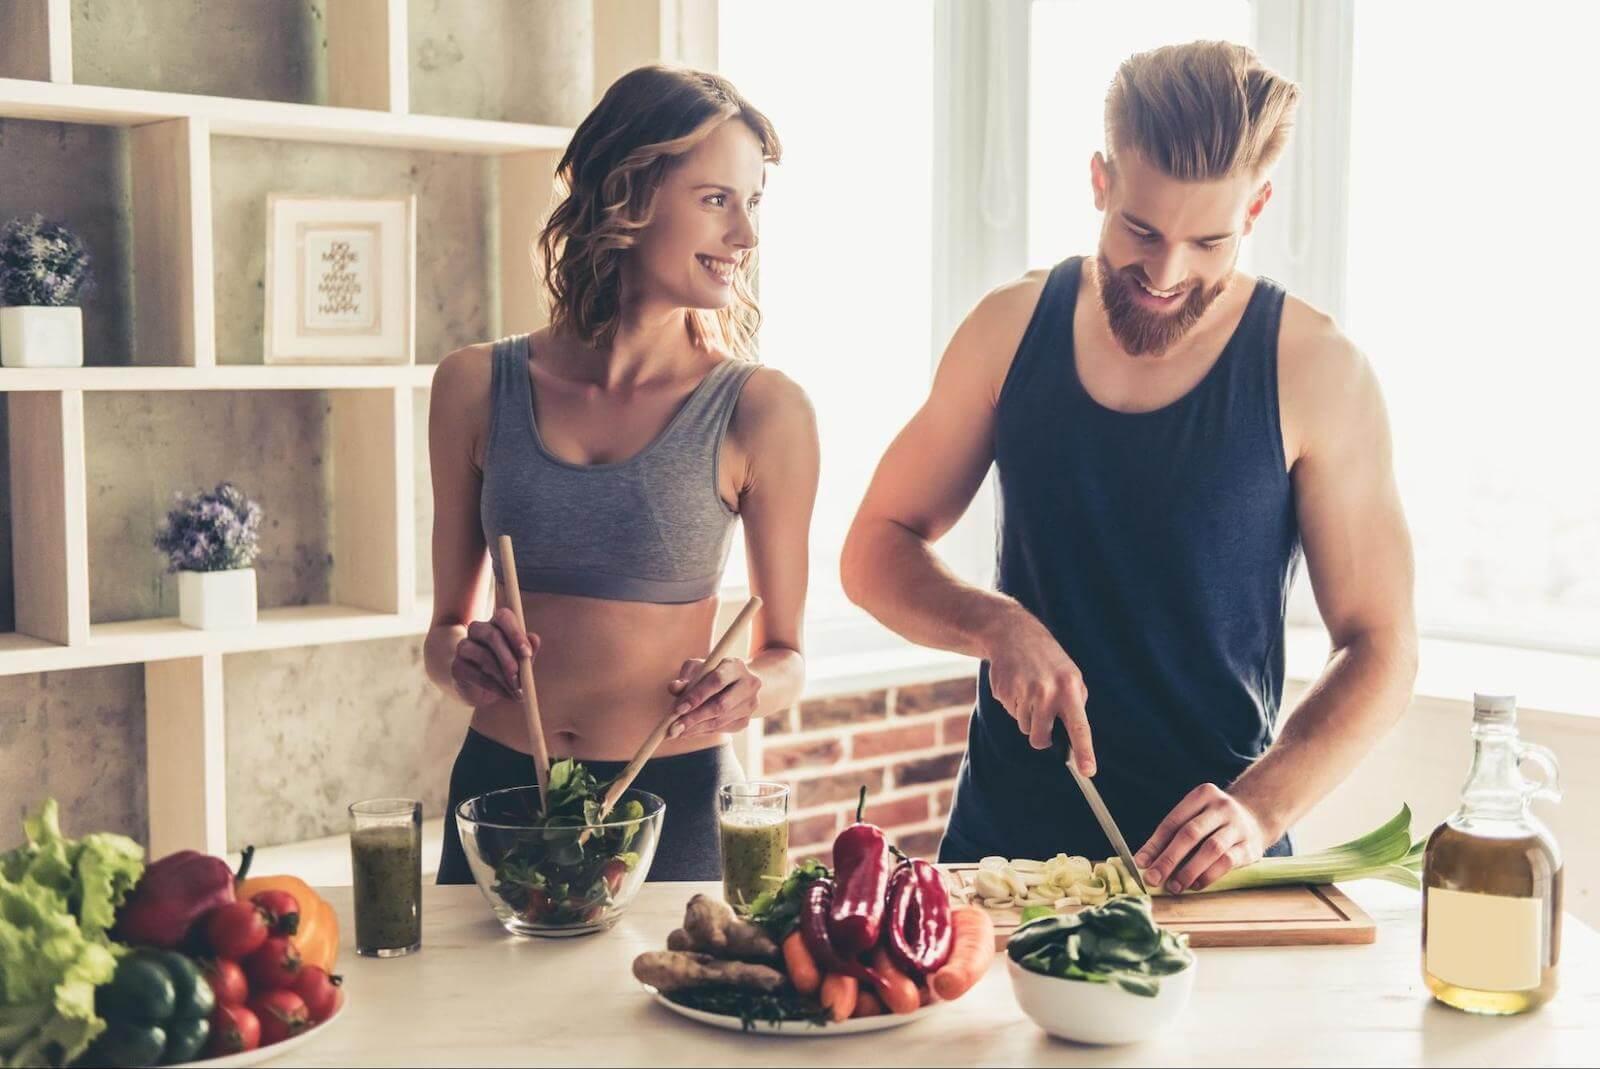 Circadian rhythm fasting: couple preparing food